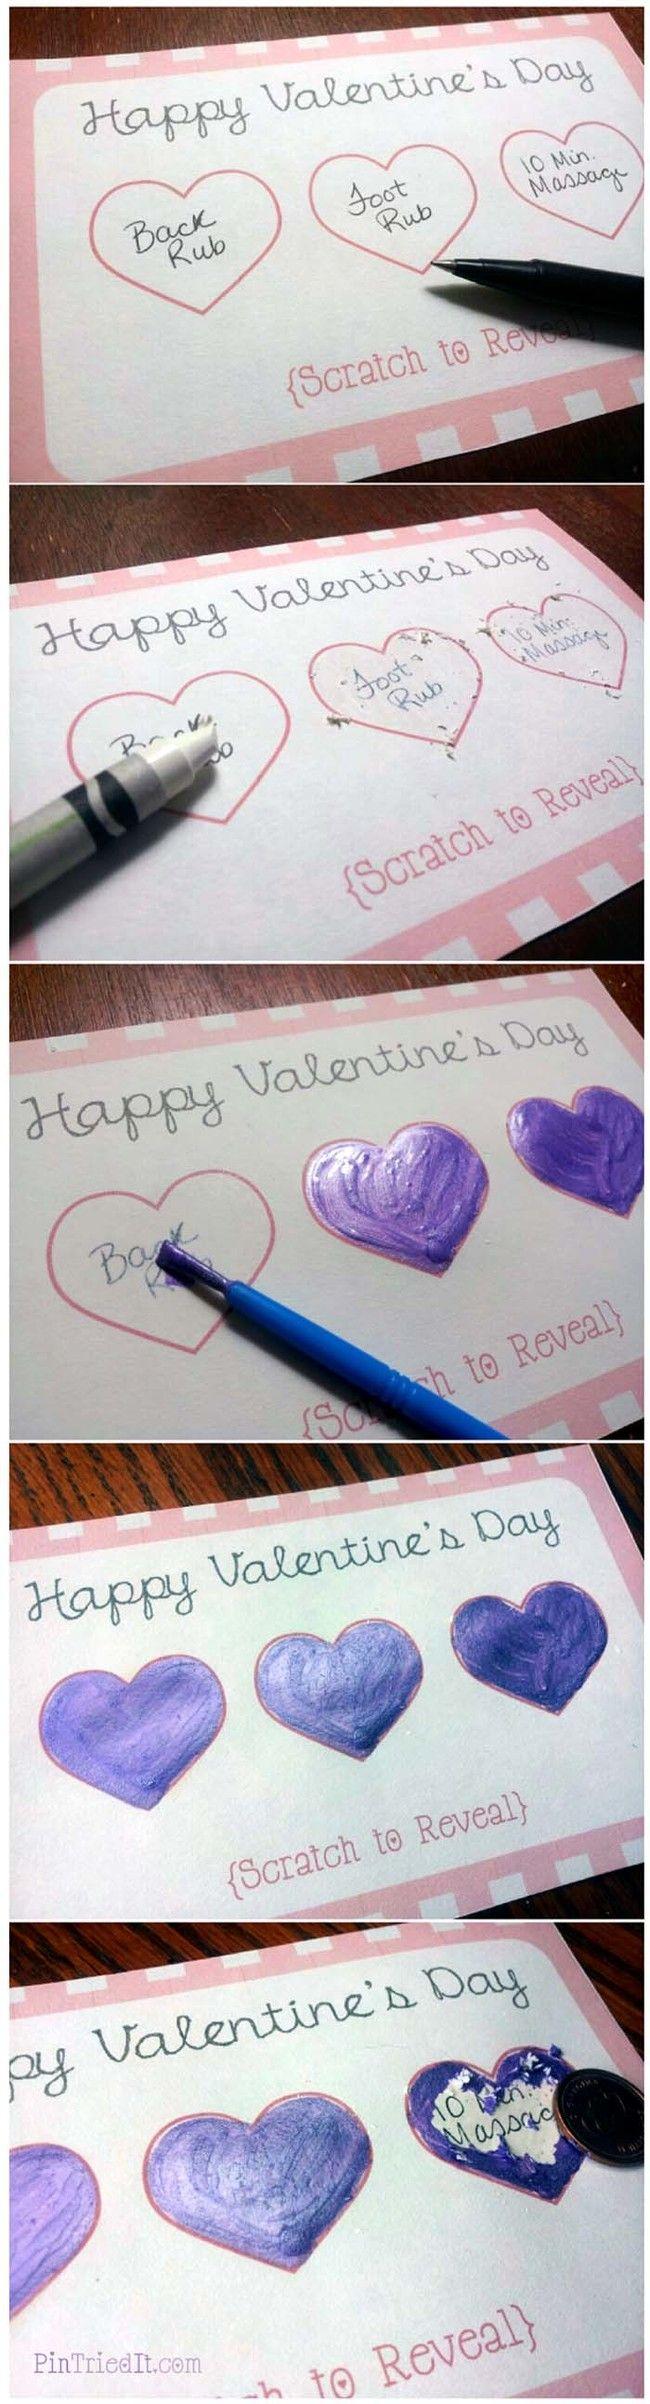 Top 25+ best Romantic ideas ideas on Pinterest | Romantic ideas ...